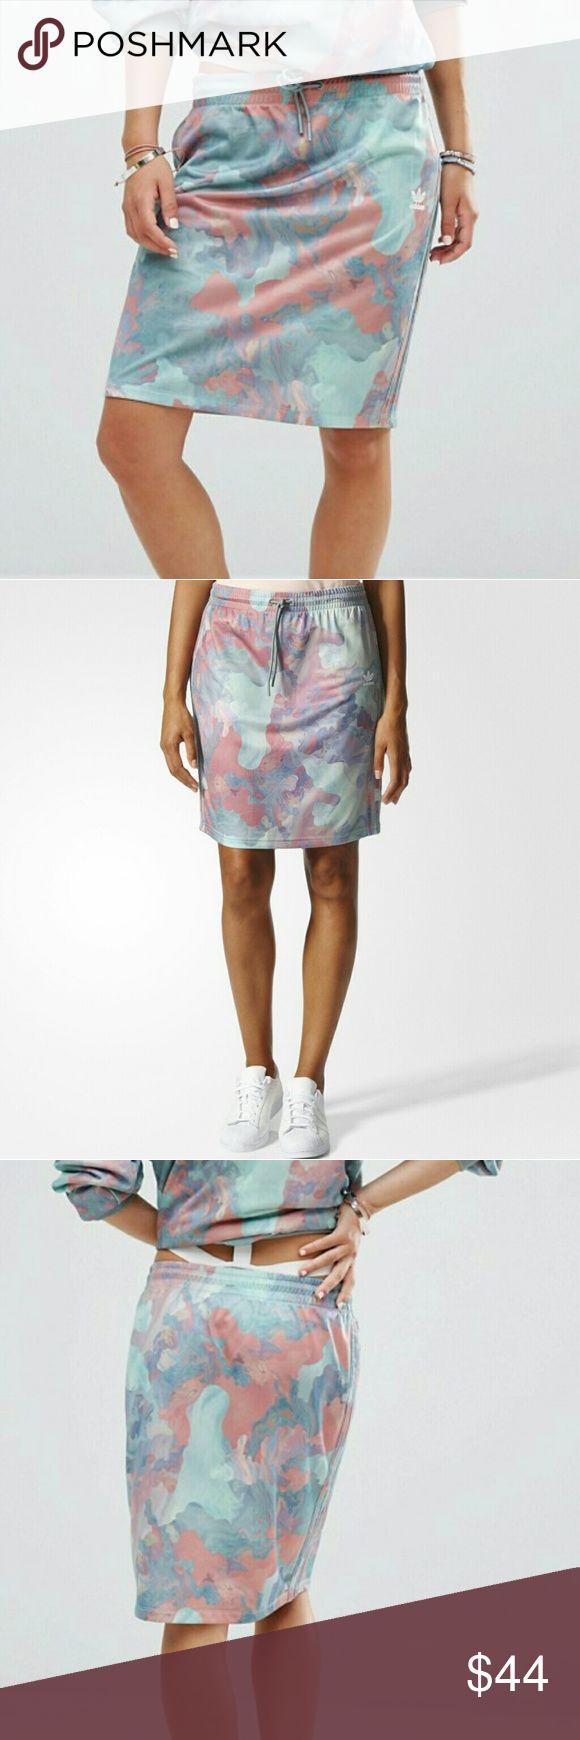 New Adidas Originals Trefoil Pastel Camo Skirt New Adidas Originals Trefoil Pastel Camo Skirt adidas Skirts